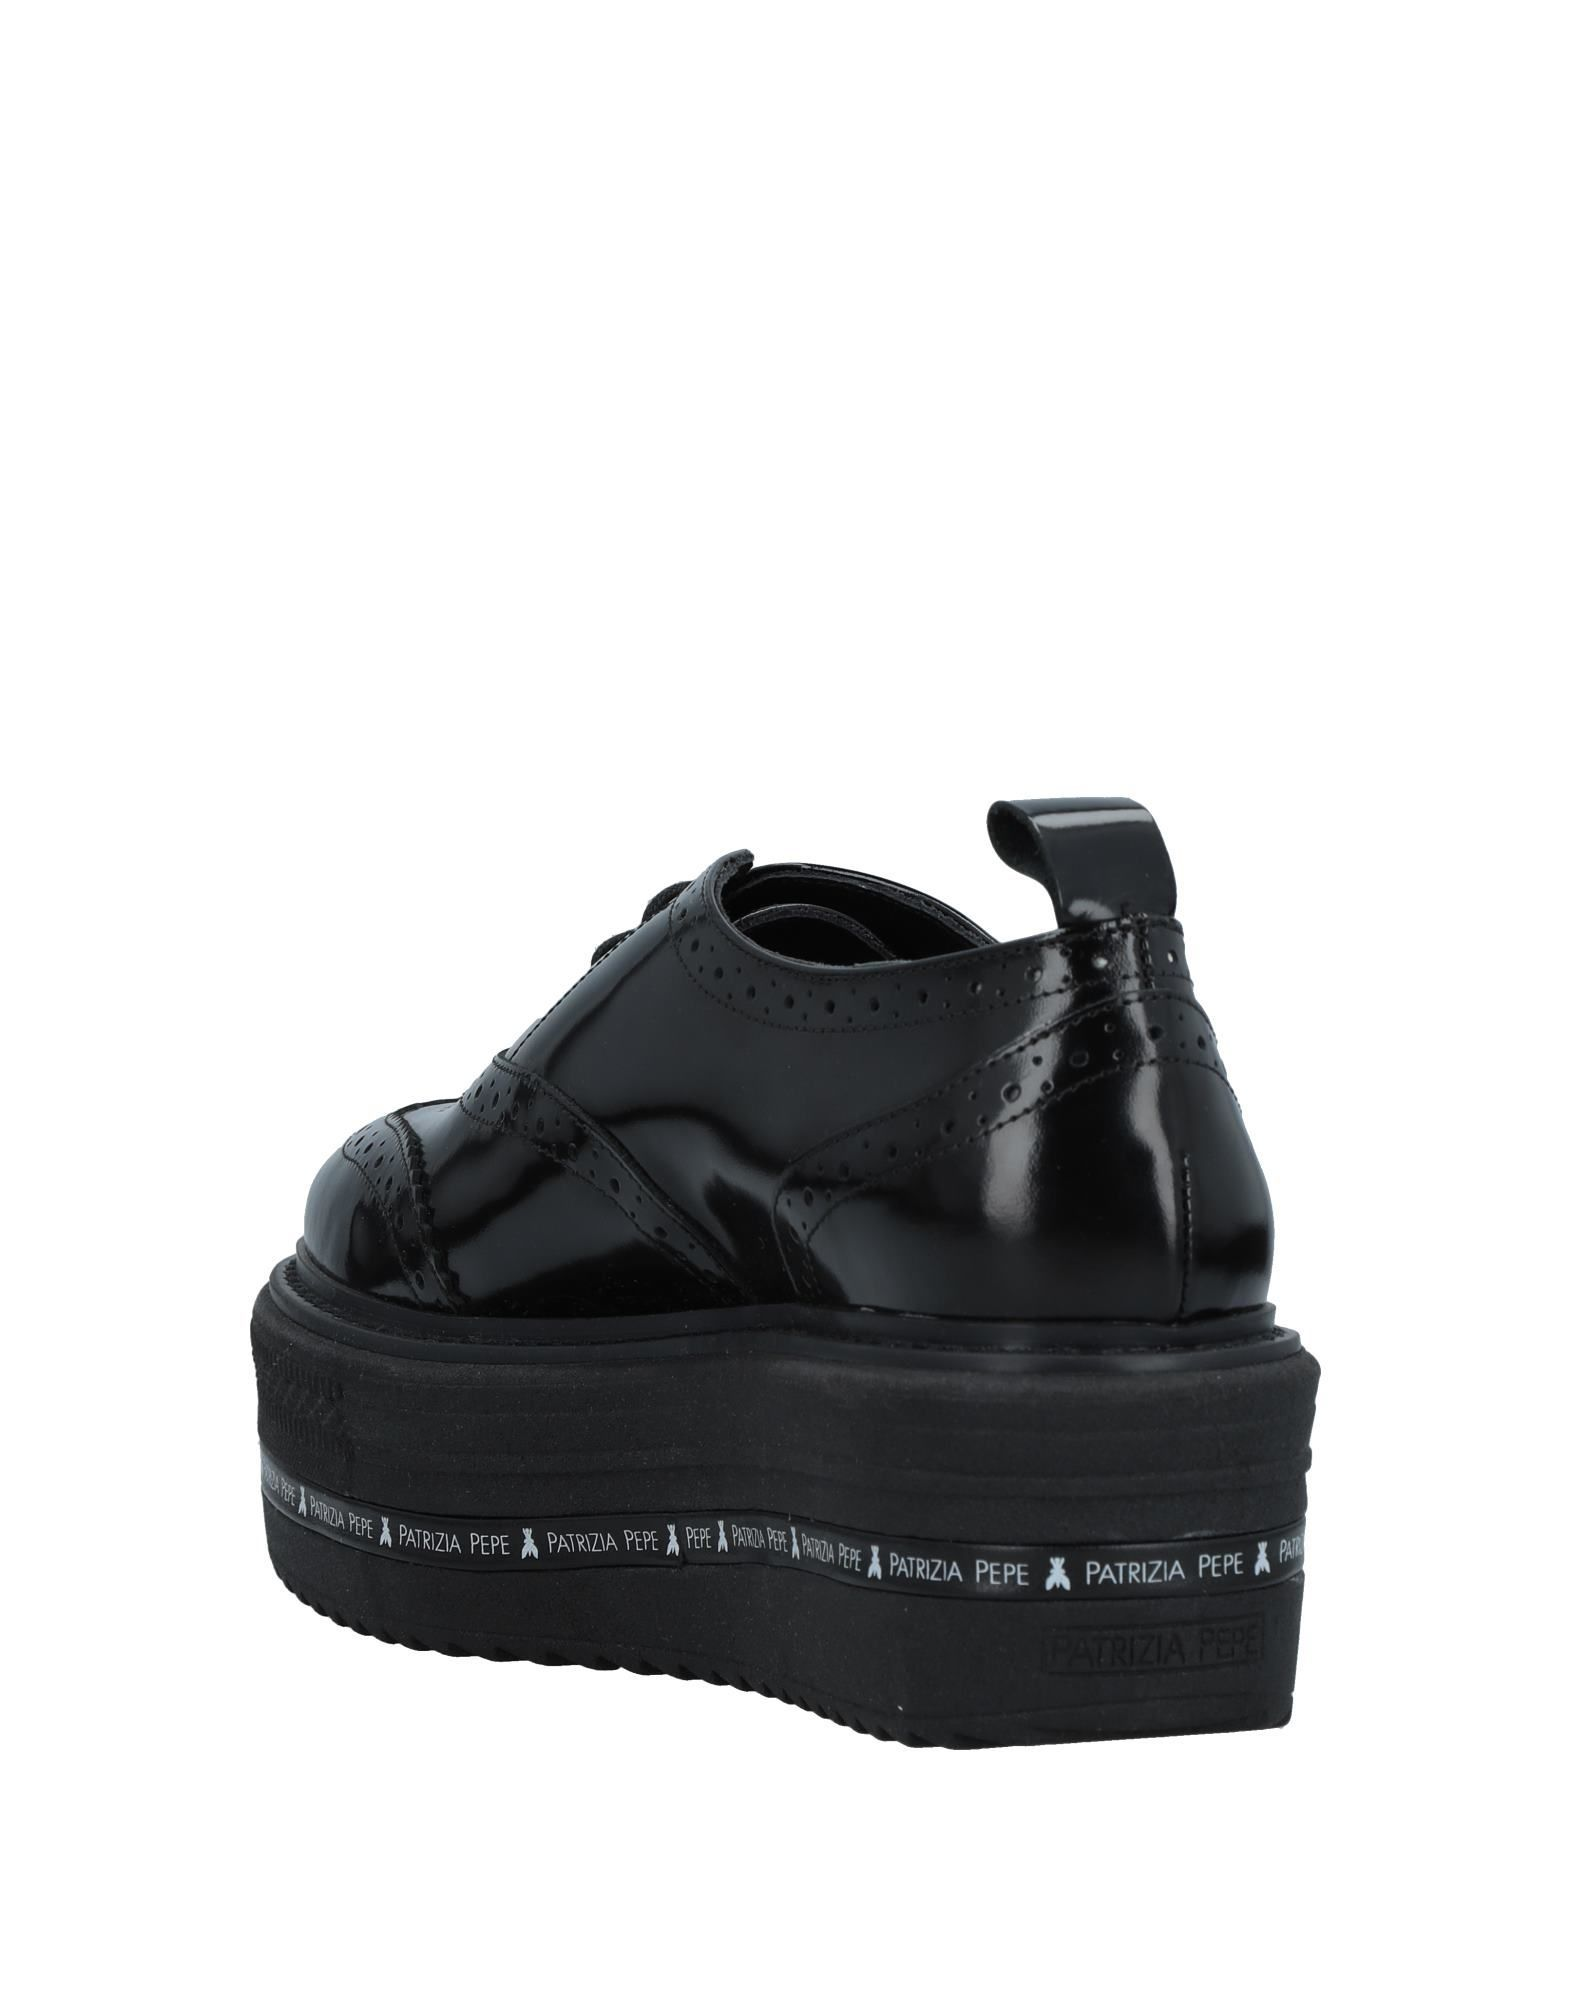 FOOTWEAR Patrizia Pepe Black Woman Leather